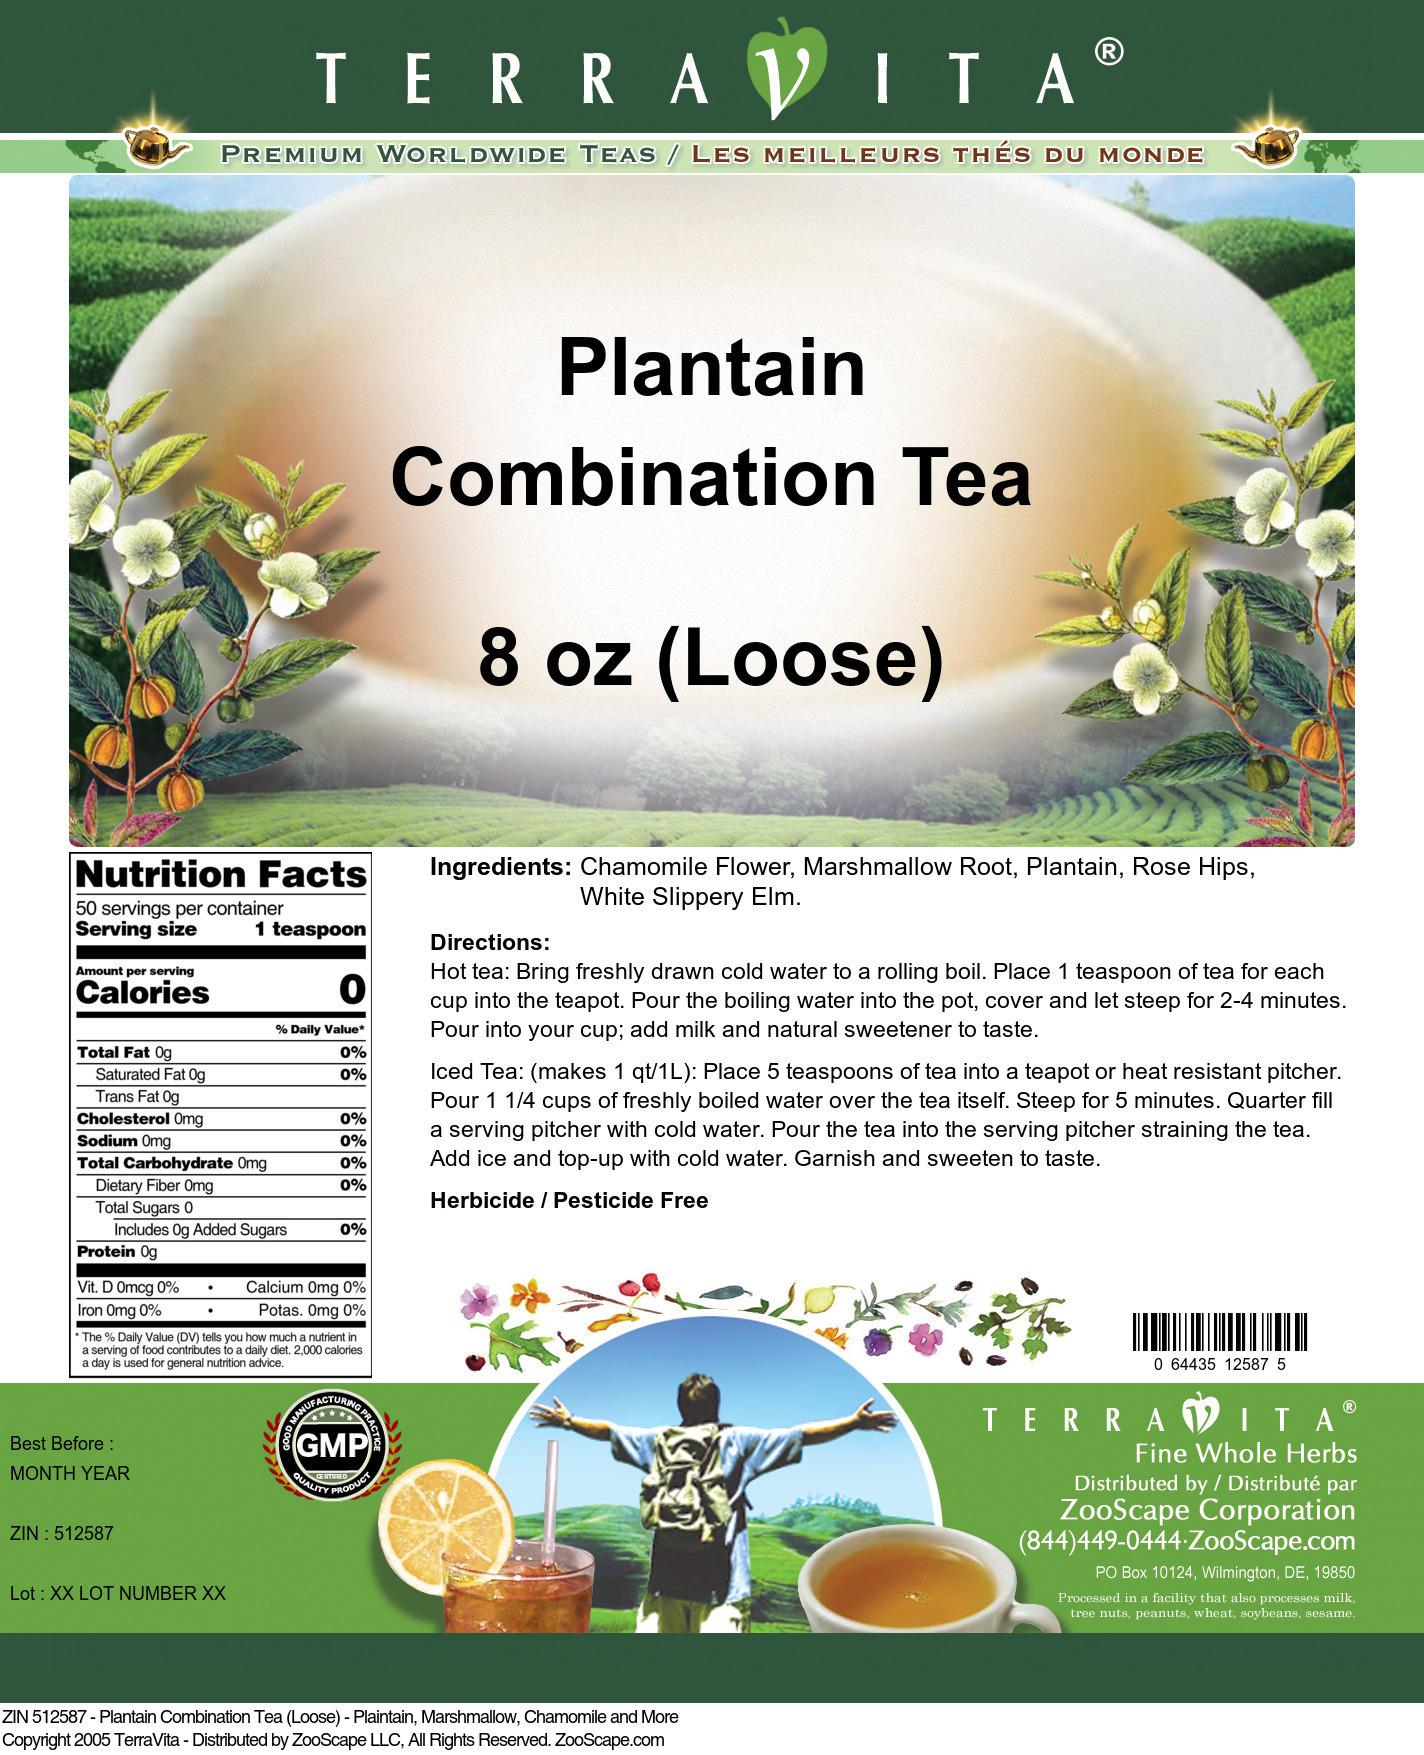 Plantain Combination Tea (Loose) - Plaintain, Marshmallow, Chamomile and More